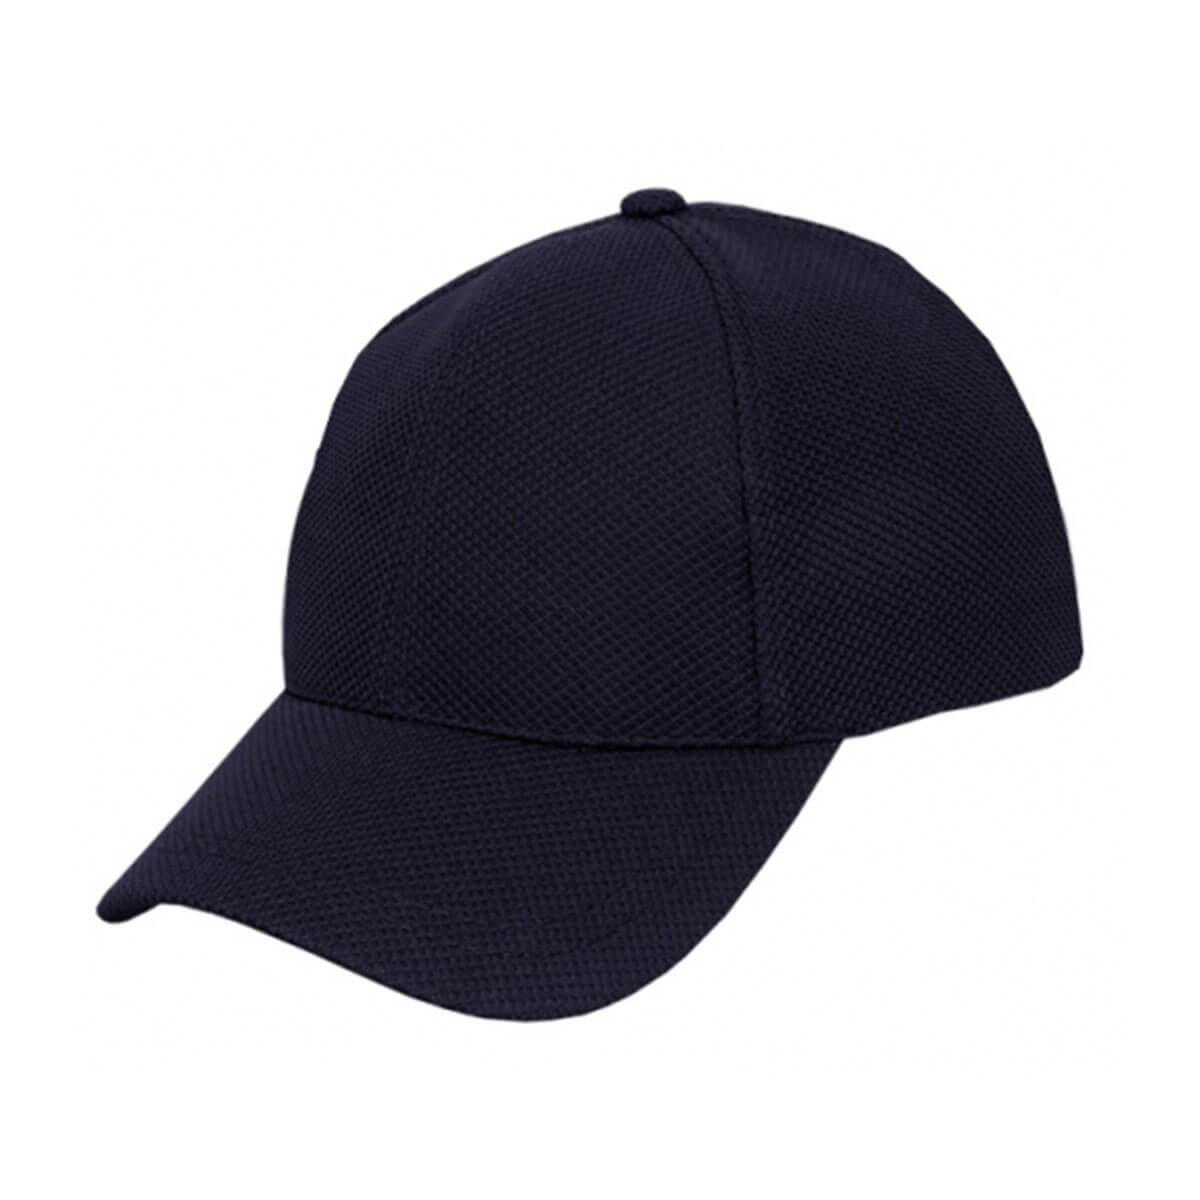 PQ Mesh Plain Sandwich Design Cap-Navy